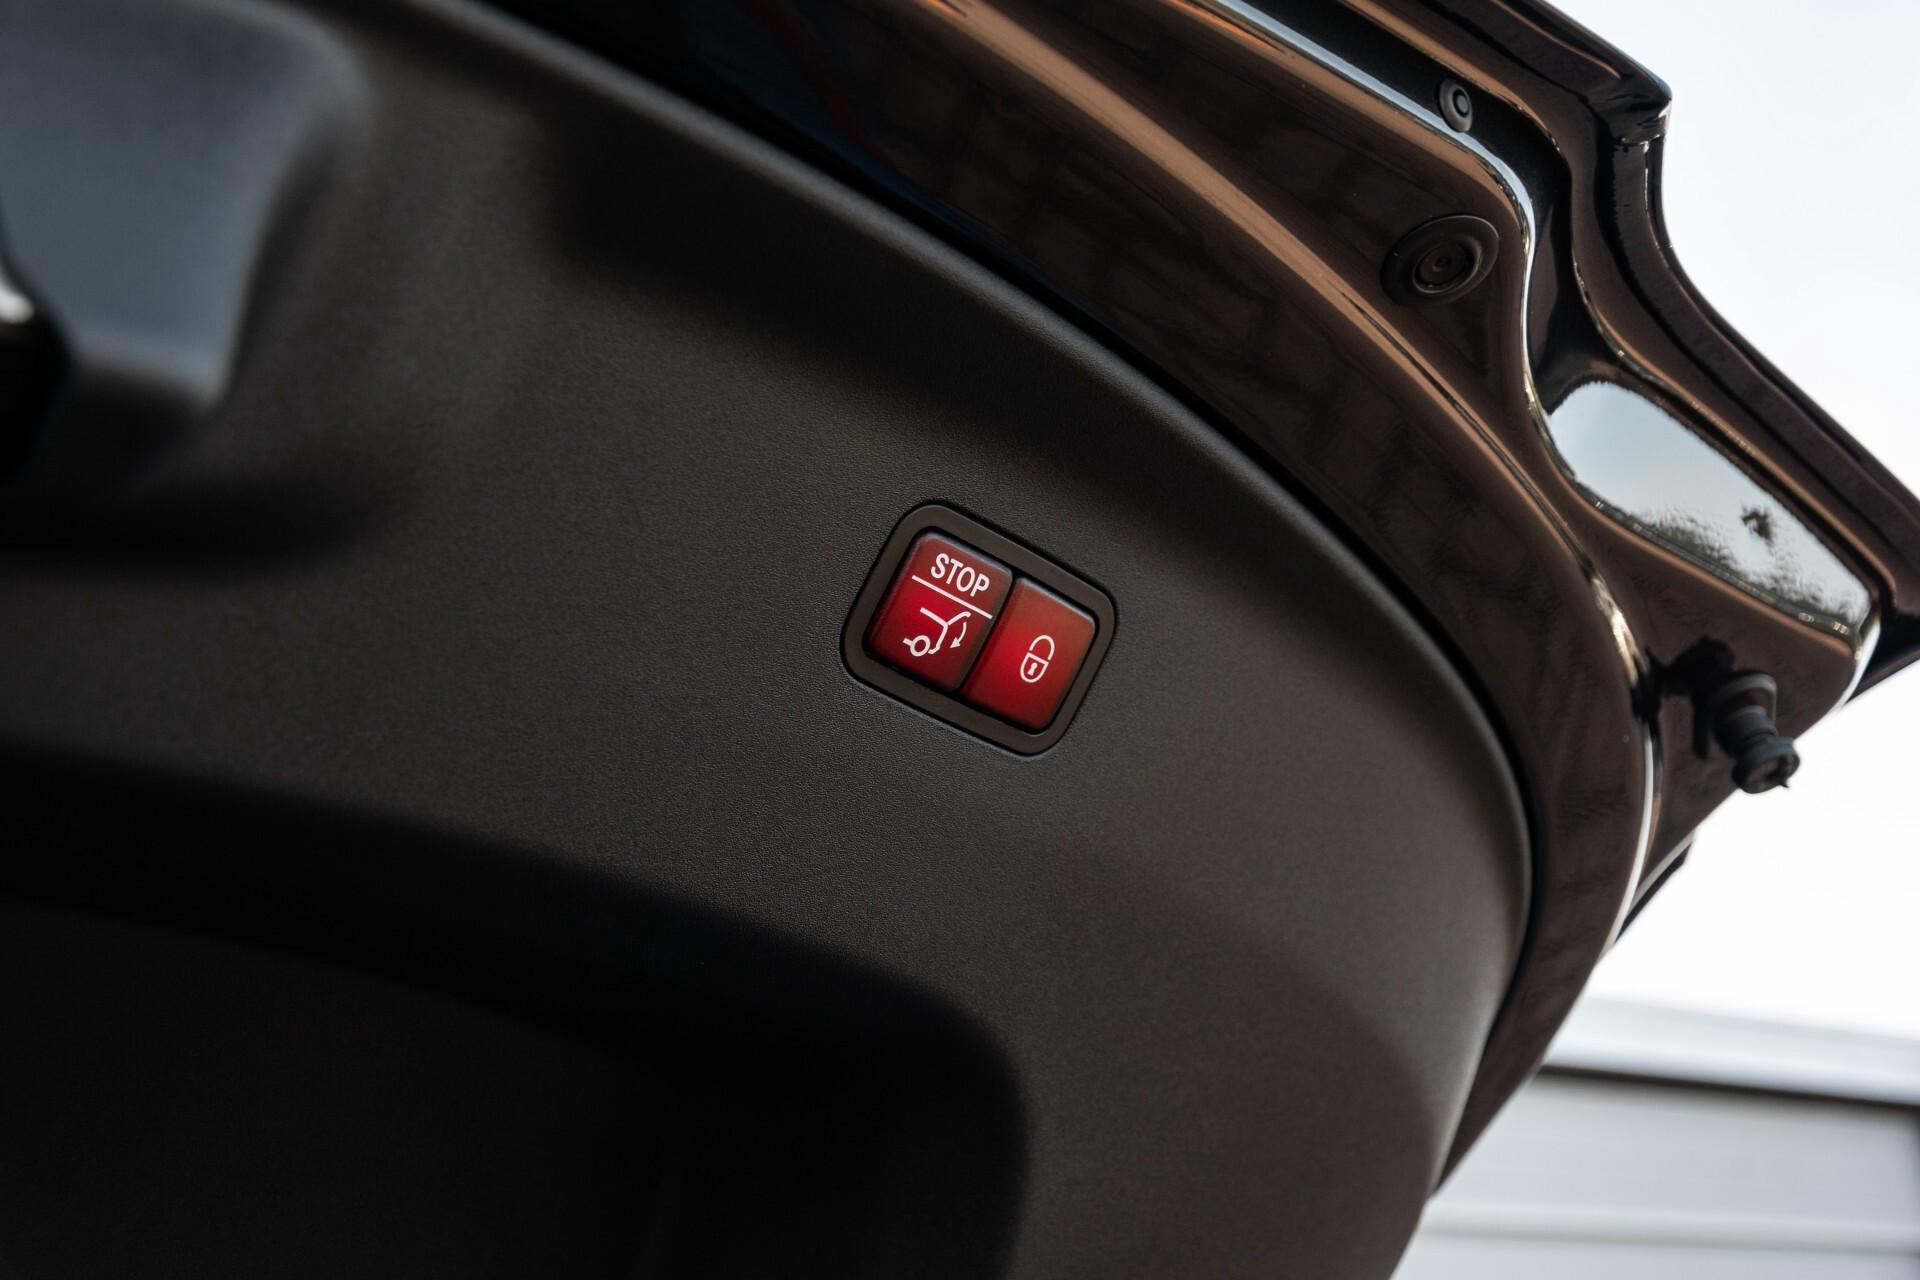 Mercedes-Benz AMG GT 4-Door Coupe 63 S 4MATIC+ Edition 1 Keramisch/Carbon/First Class/Dynamic Plus/Burmester High End 3D Aut9 Foto 80